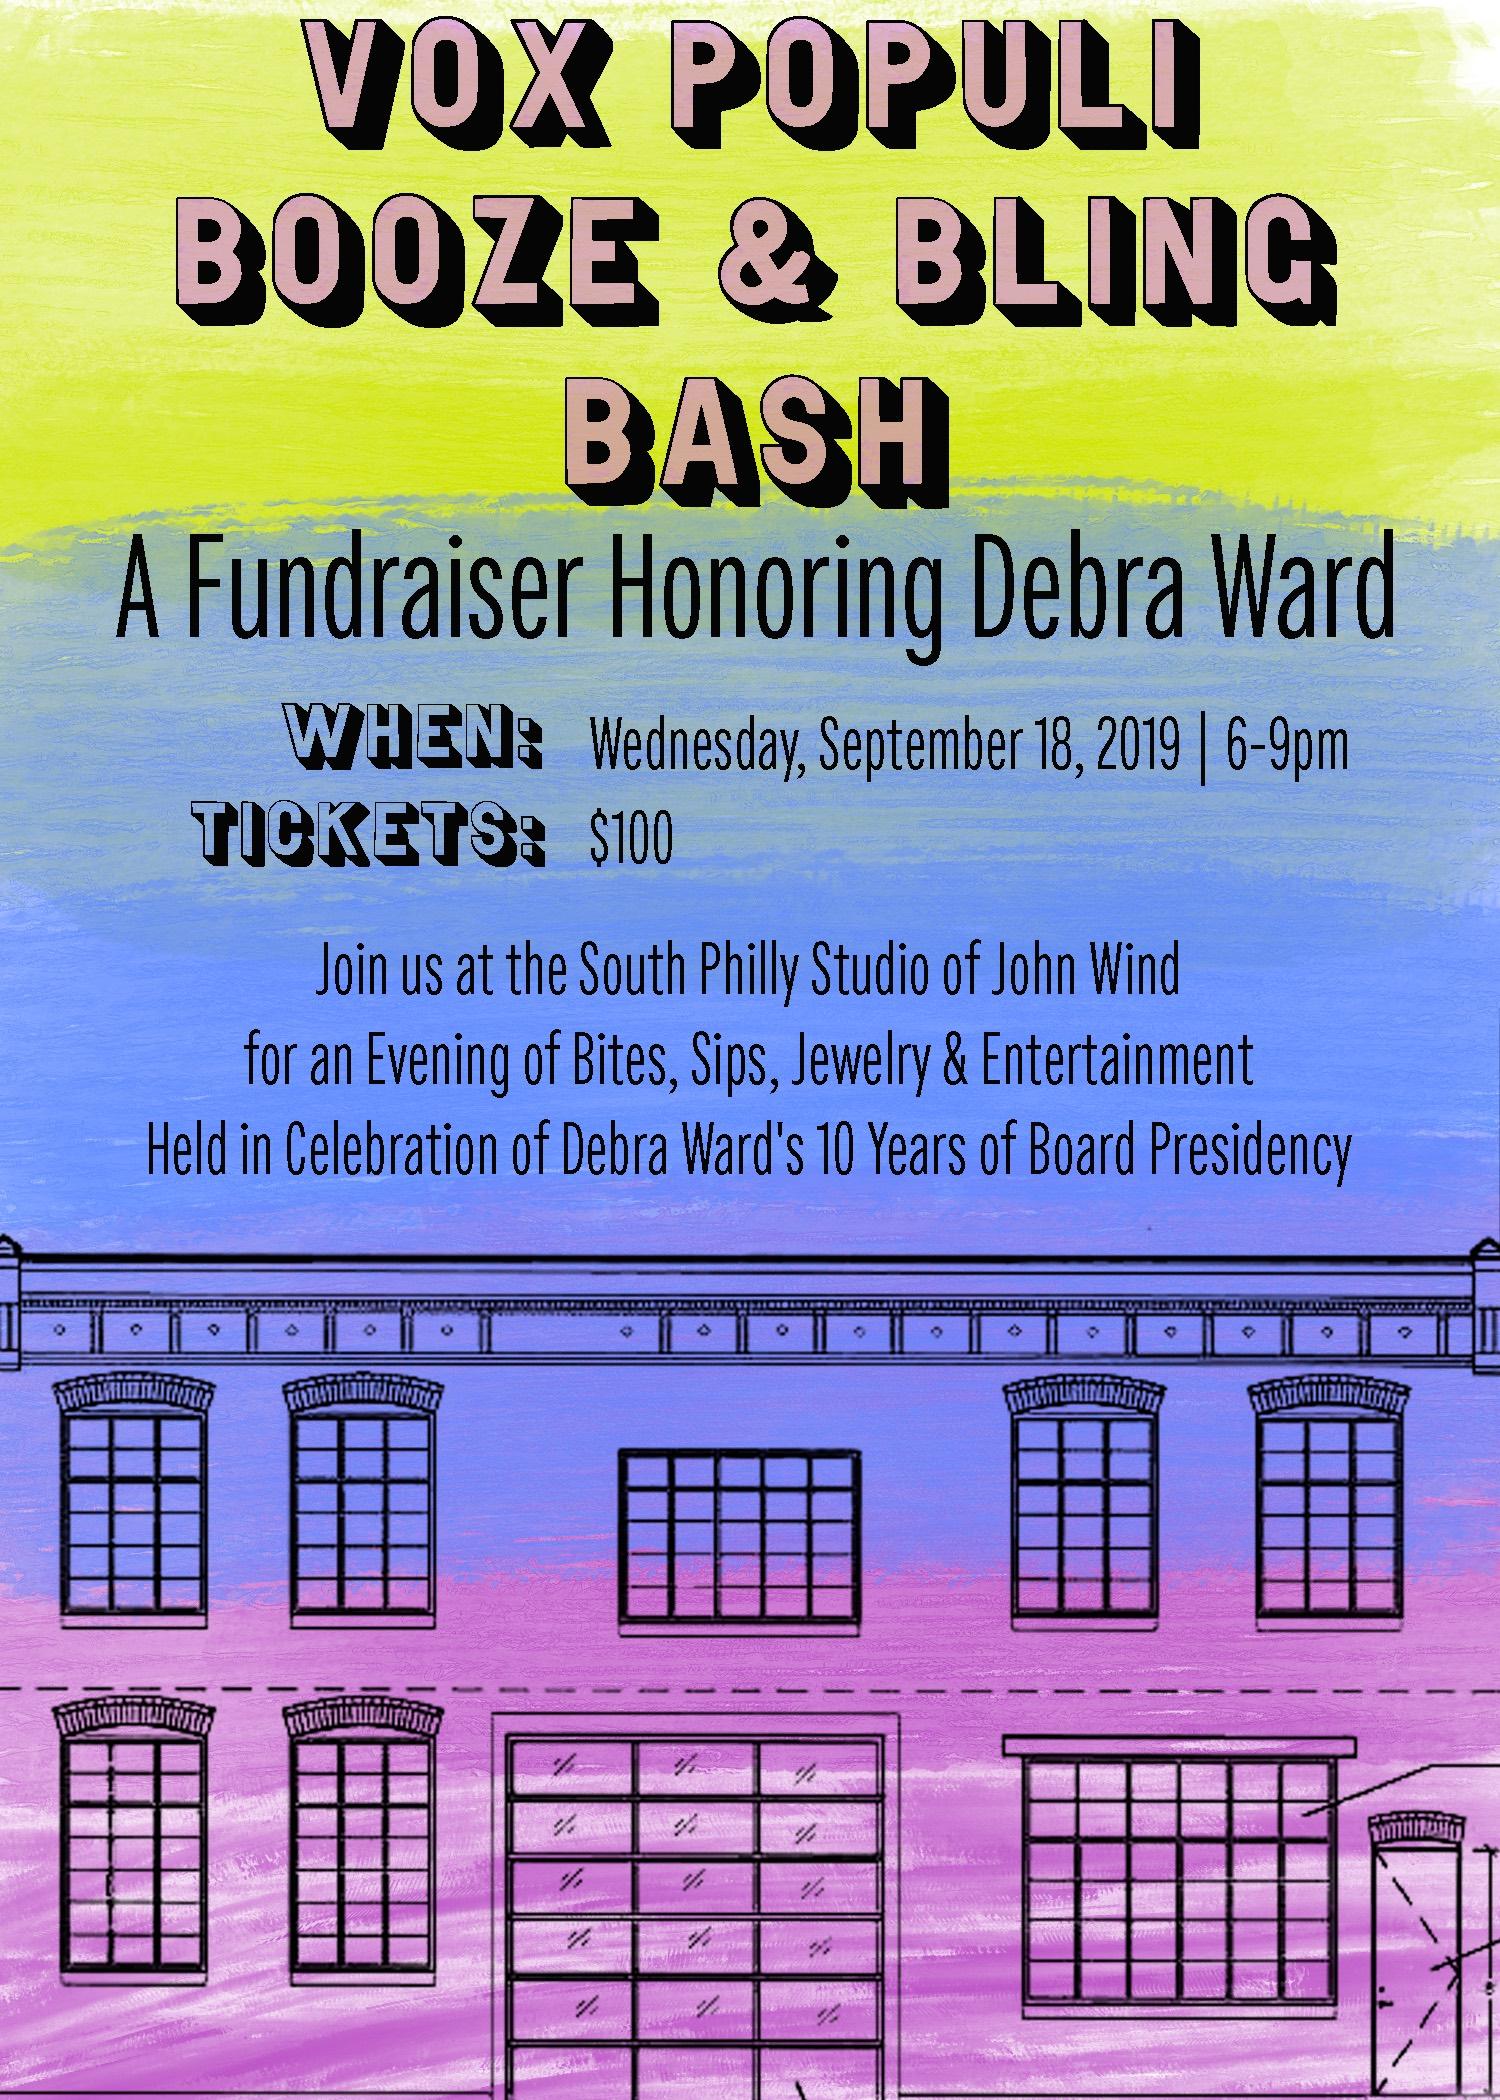 2019 Vox Populi fundraiser honoring Debra Ward - save the date poster